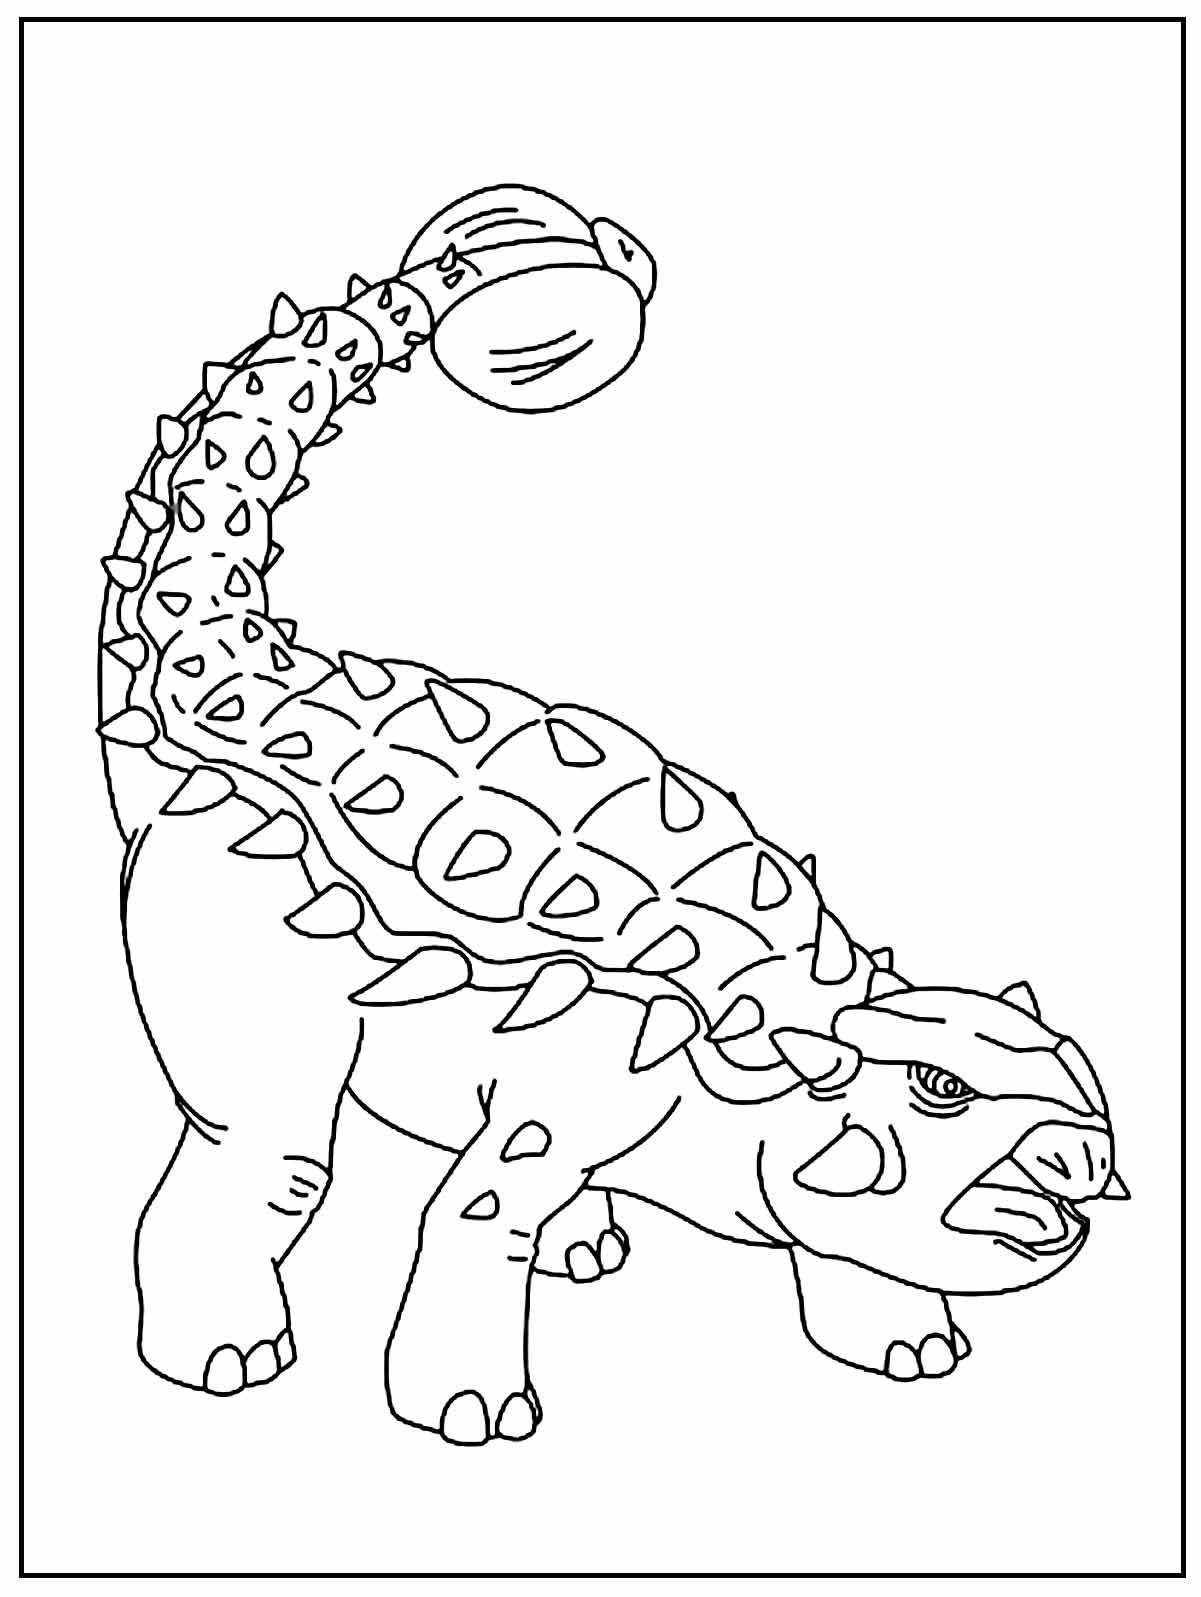 Dinosaur coloring image